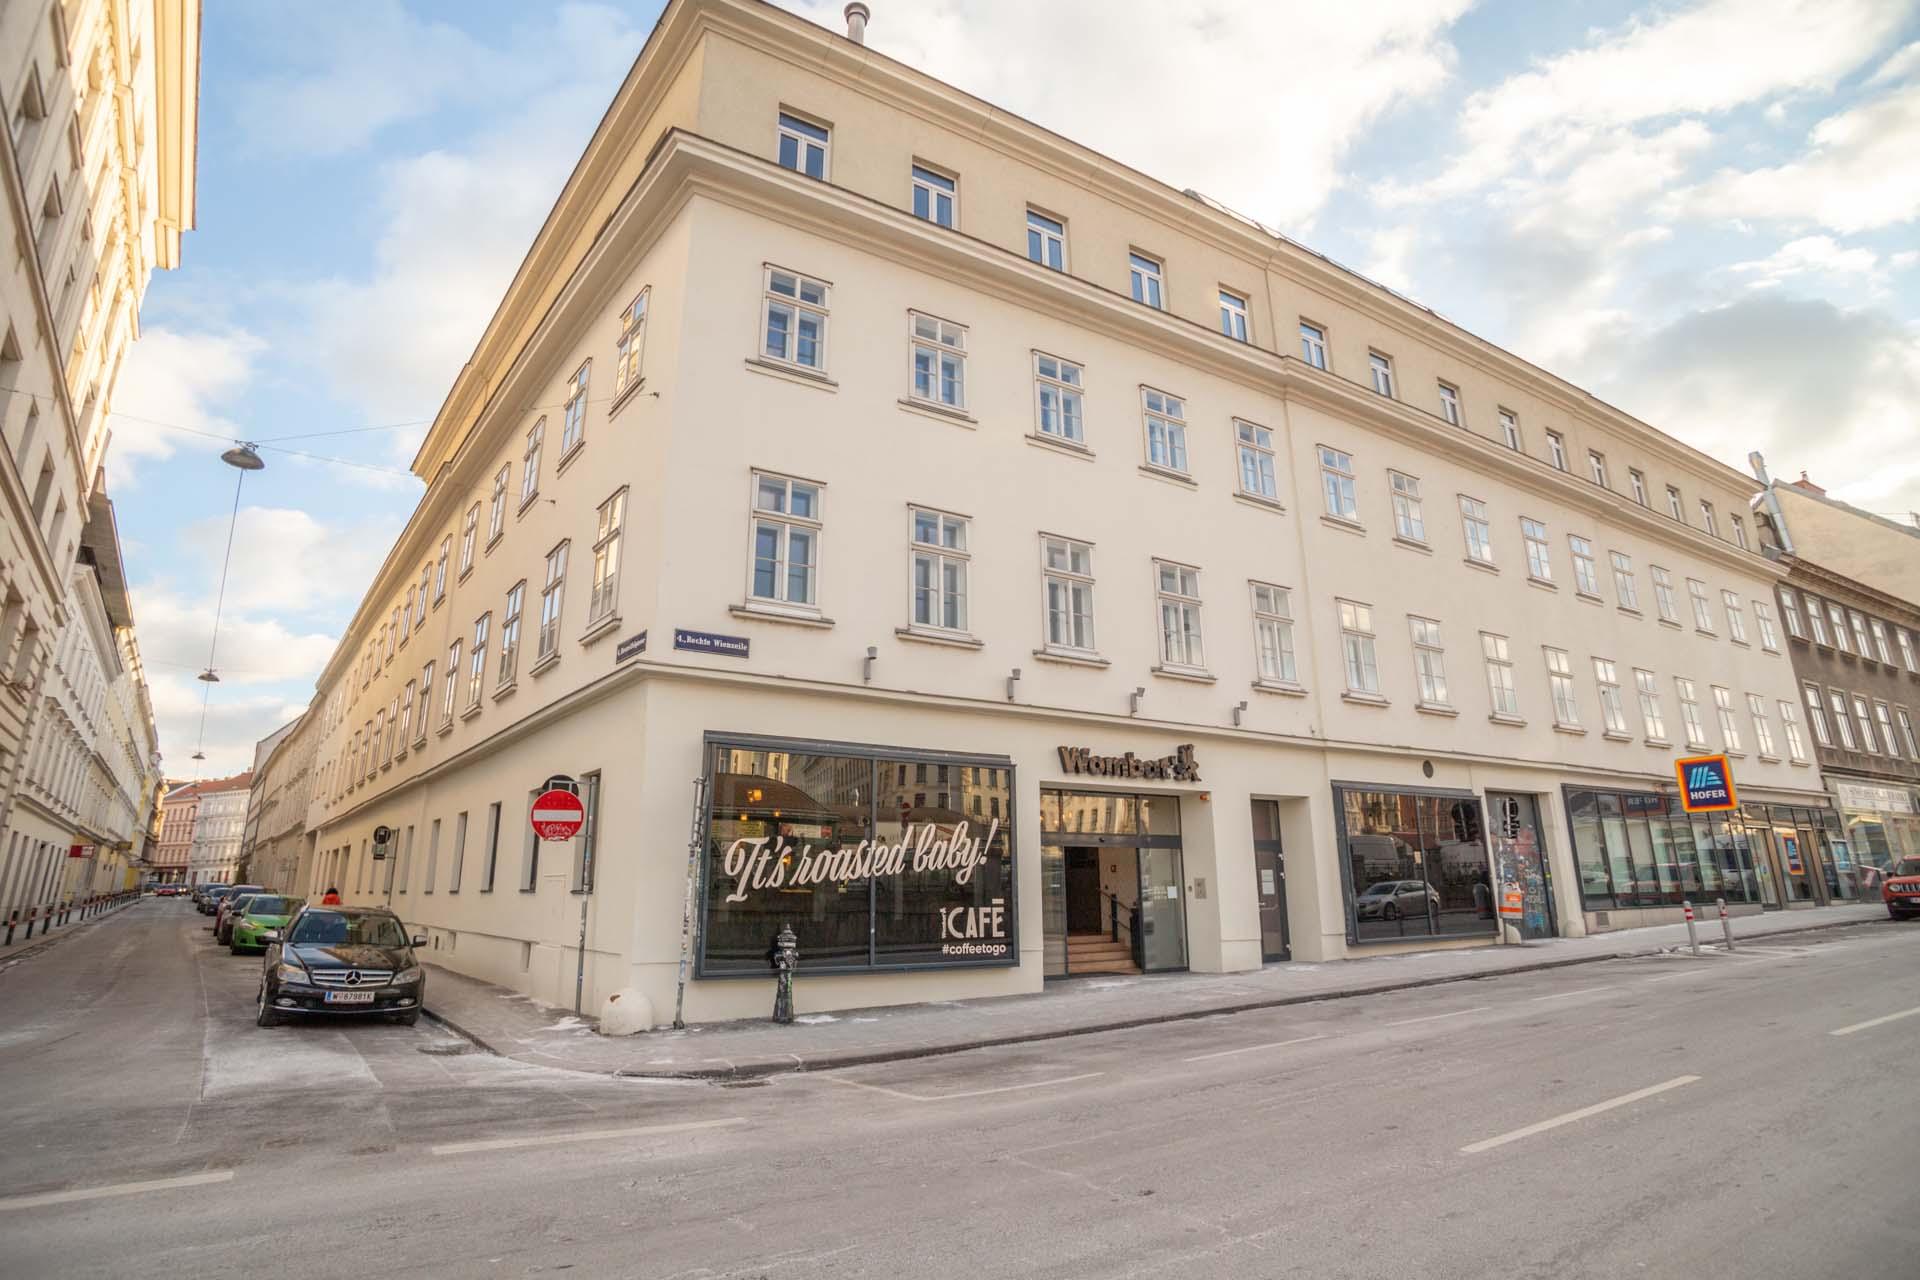 Wombats Wien Naschmarkt Hostel Gebäude